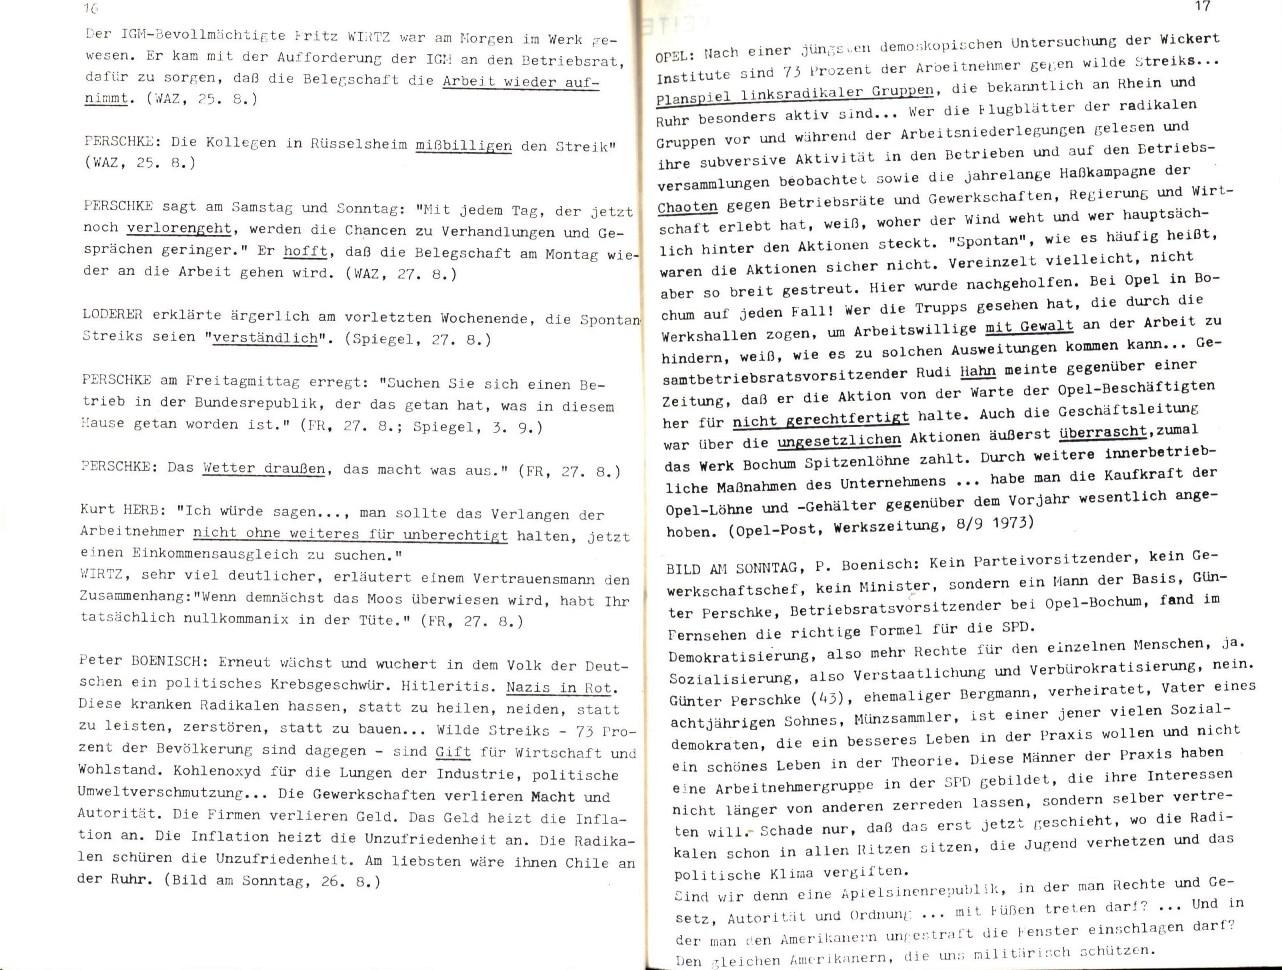 Bochum_IGM_Opel_PG_Opel_streikt_1973_010